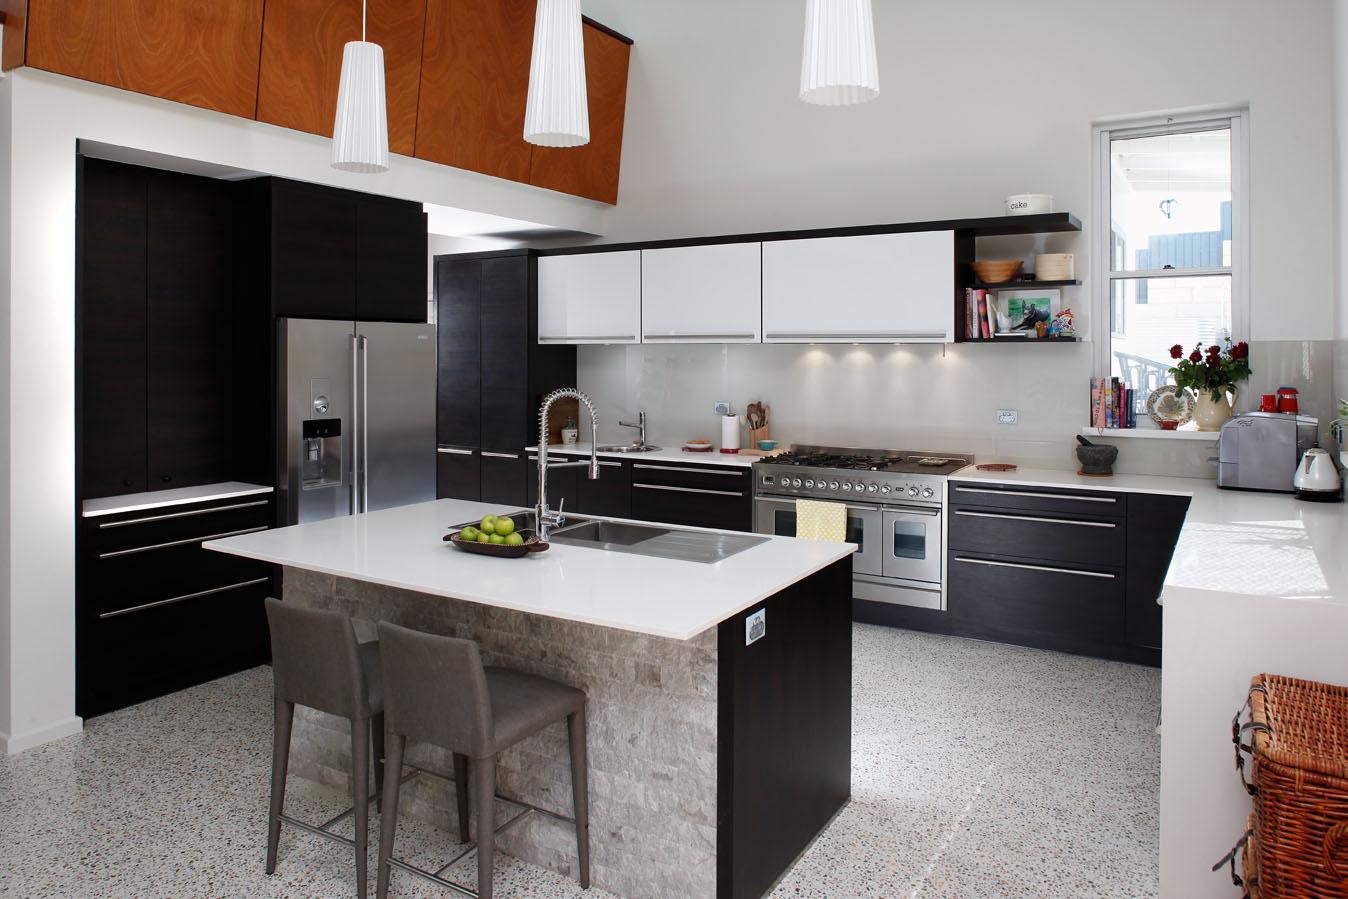 Quality kitchen design and renovation Perth | Kitchen Haus